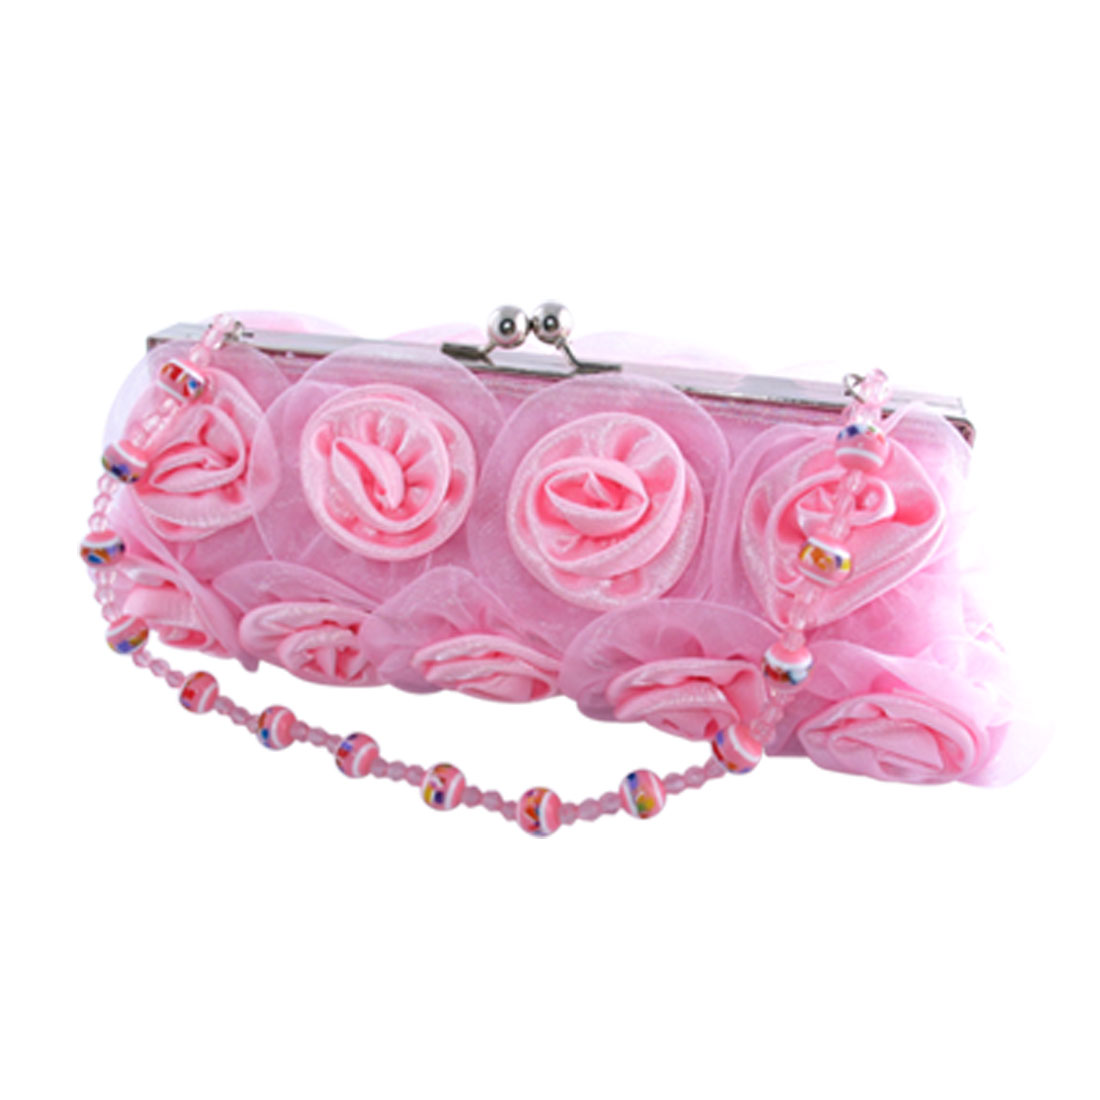 "Fashion Pink Rose Clutch Purse Bag ""Romantic"" 001"